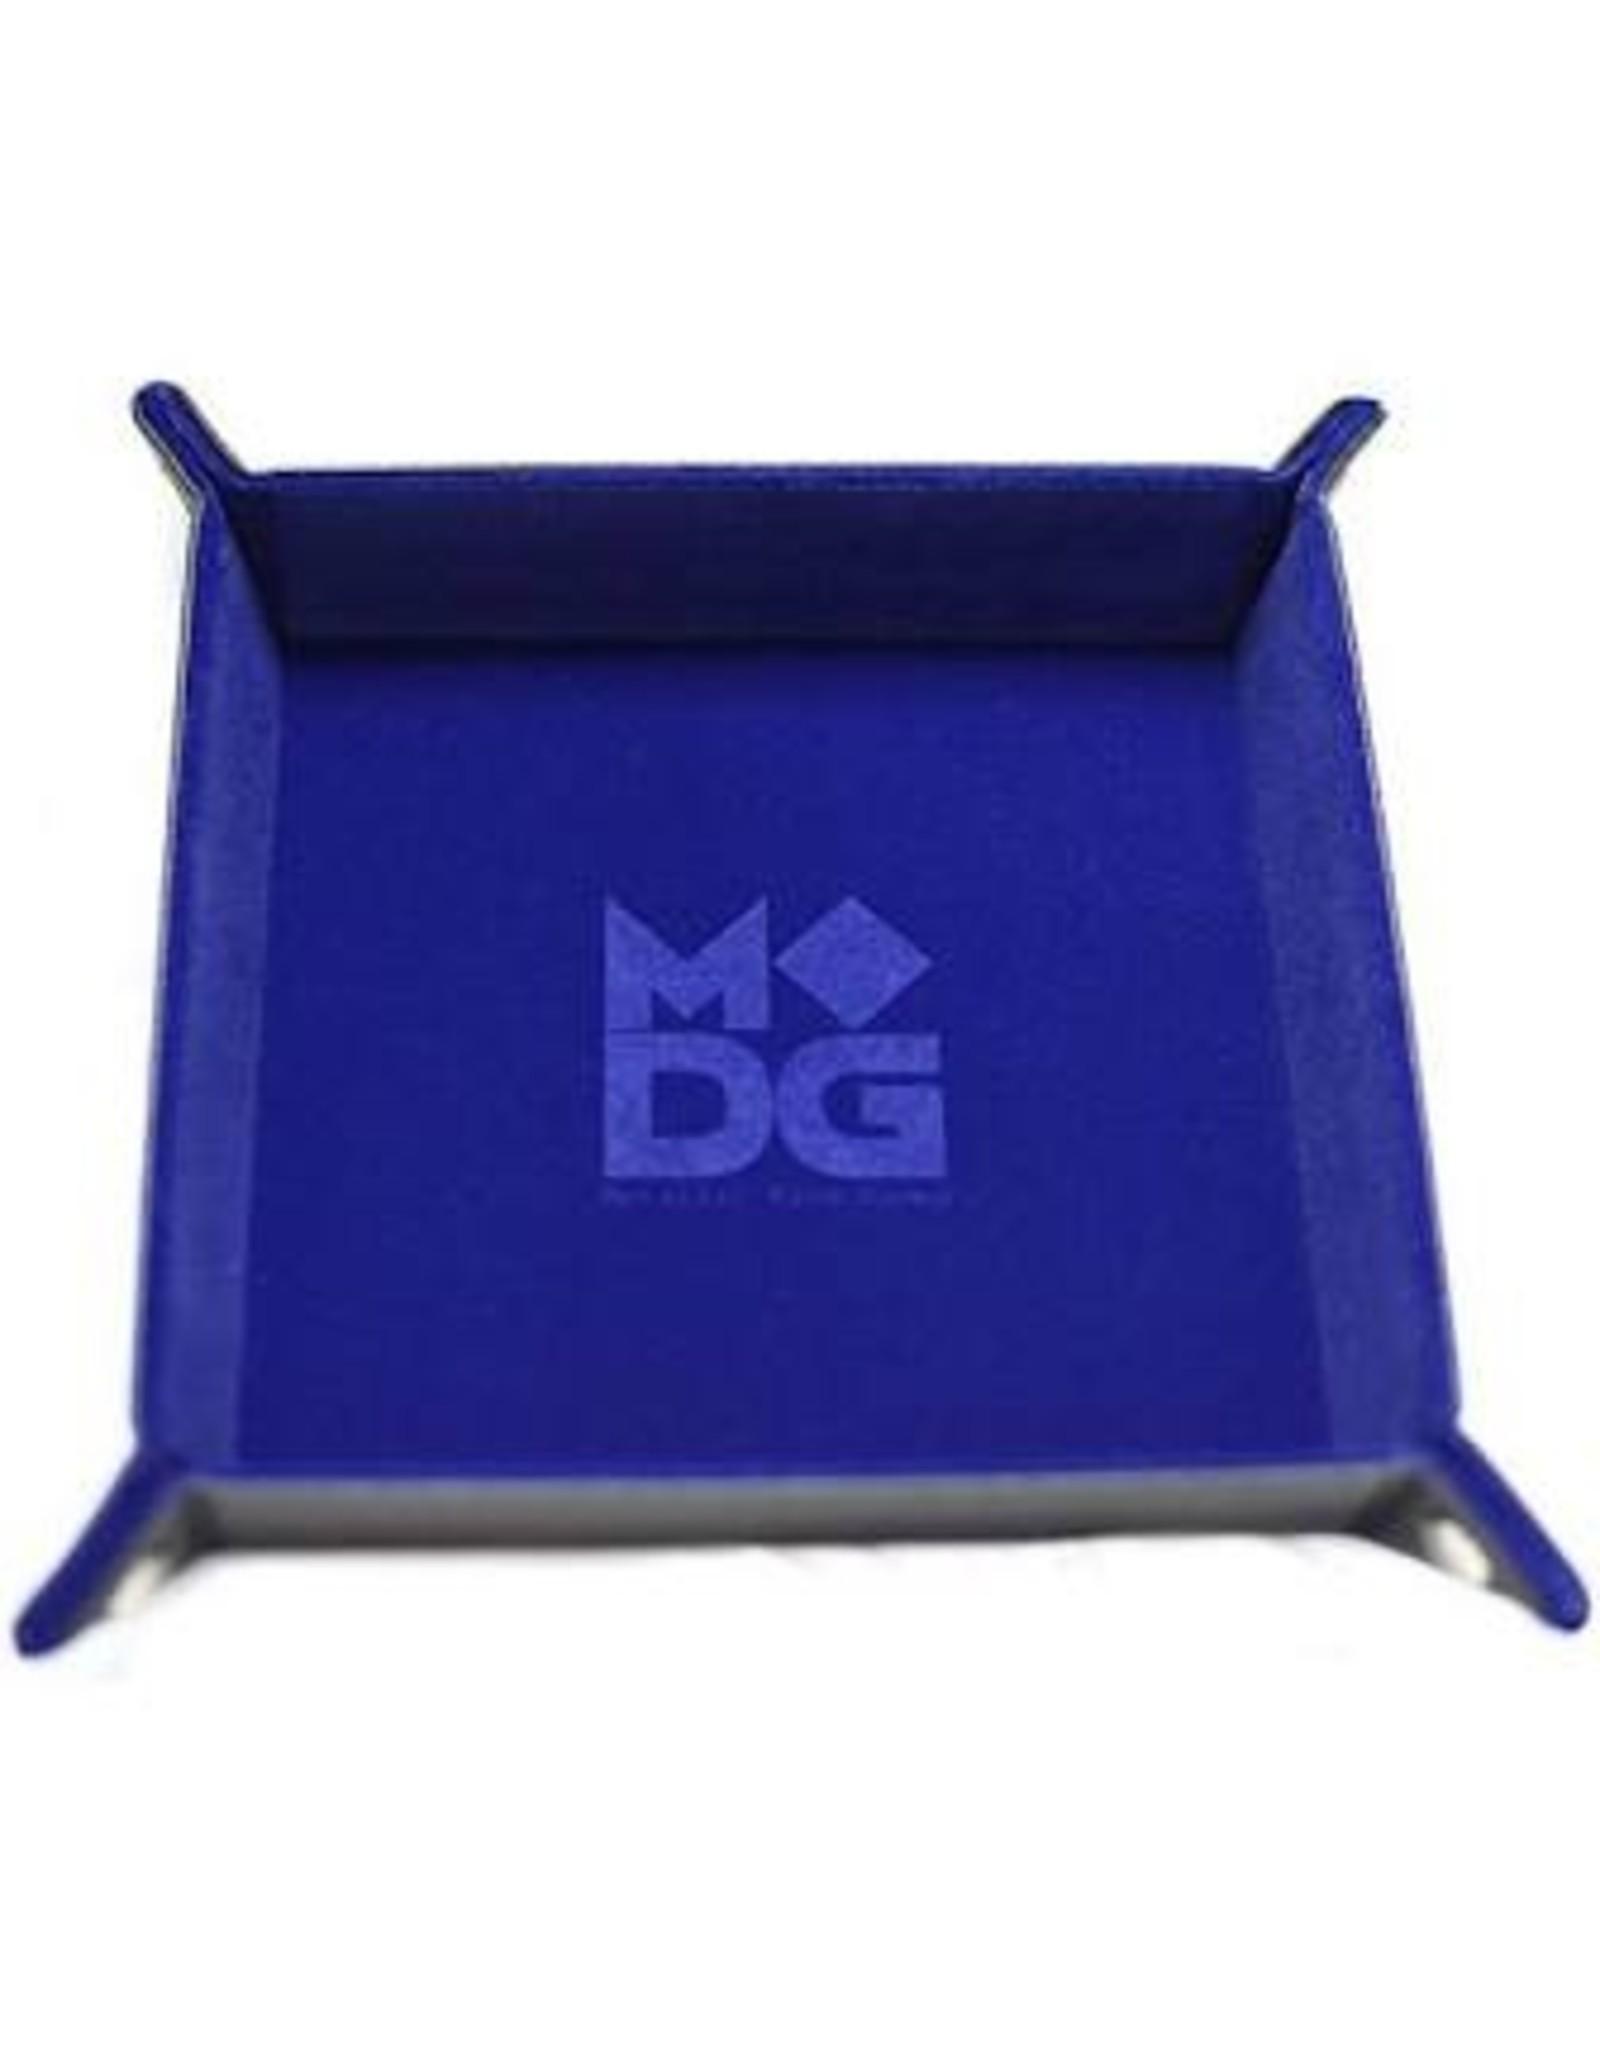 Dice Velvet Folding Dice Tray: 10x10 Blue